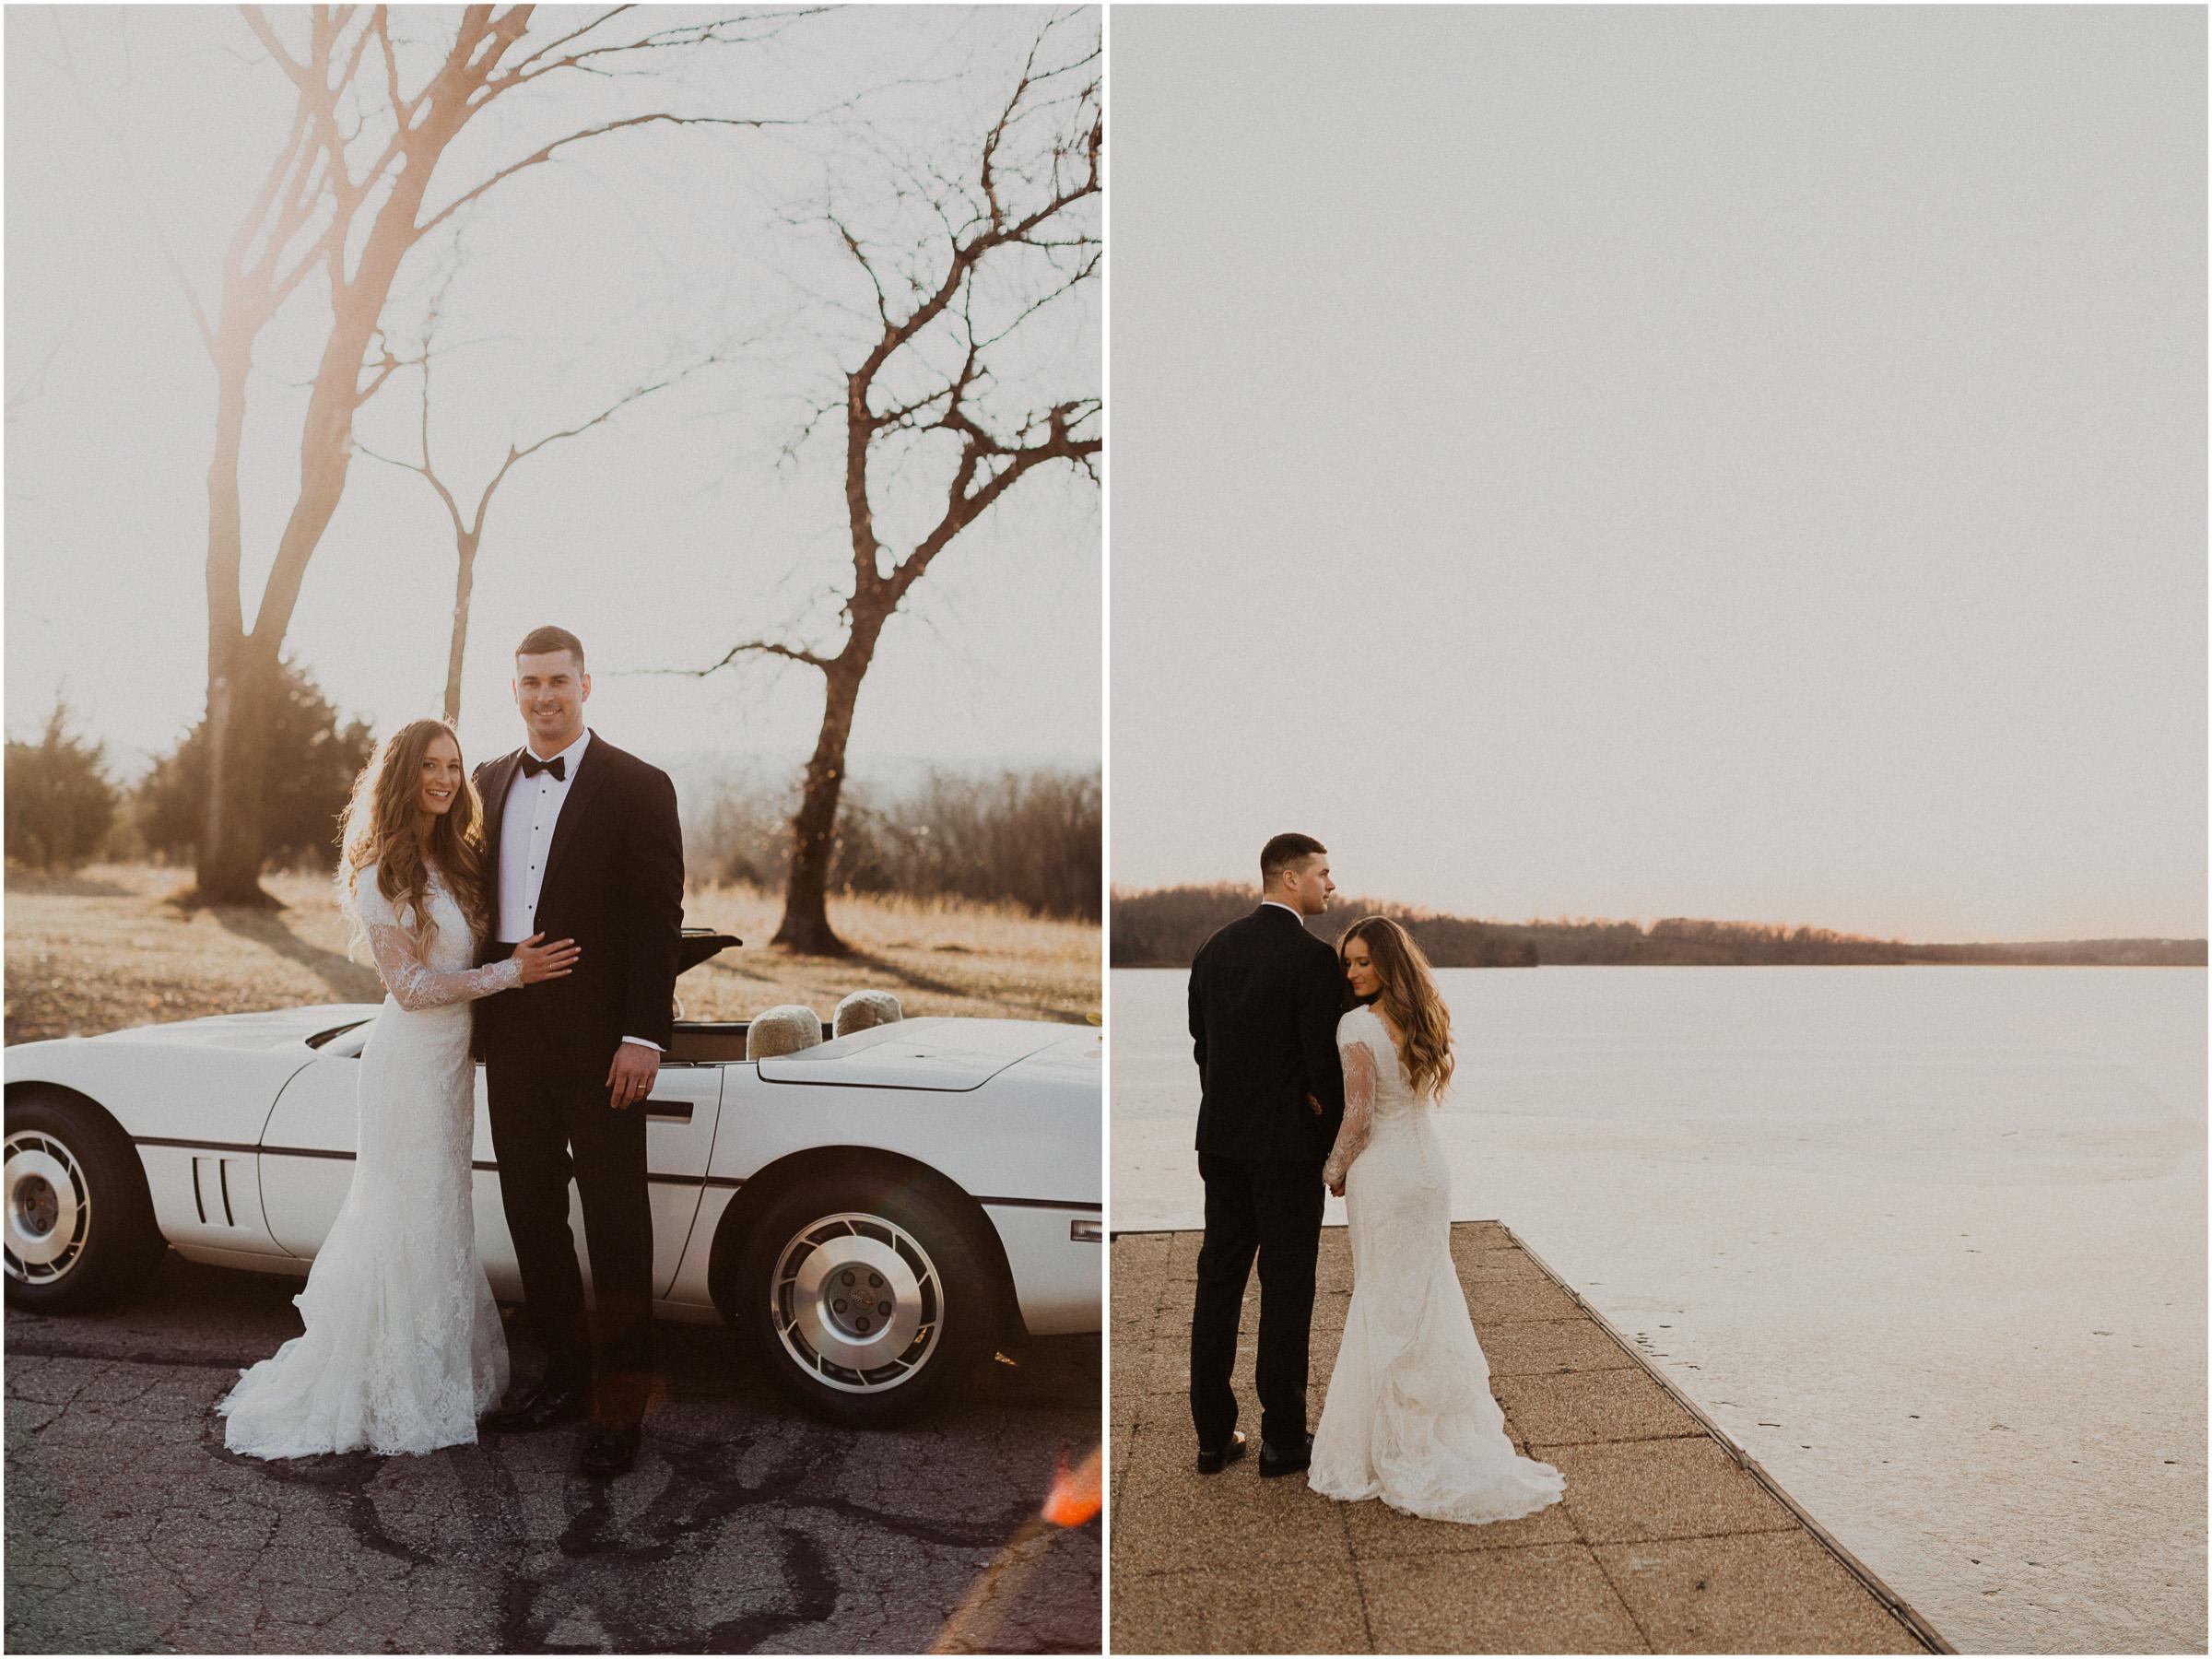 alyssa barletter photography shawnee mission park winter wedding 8th and main grandview missouri photographer-18.jpg